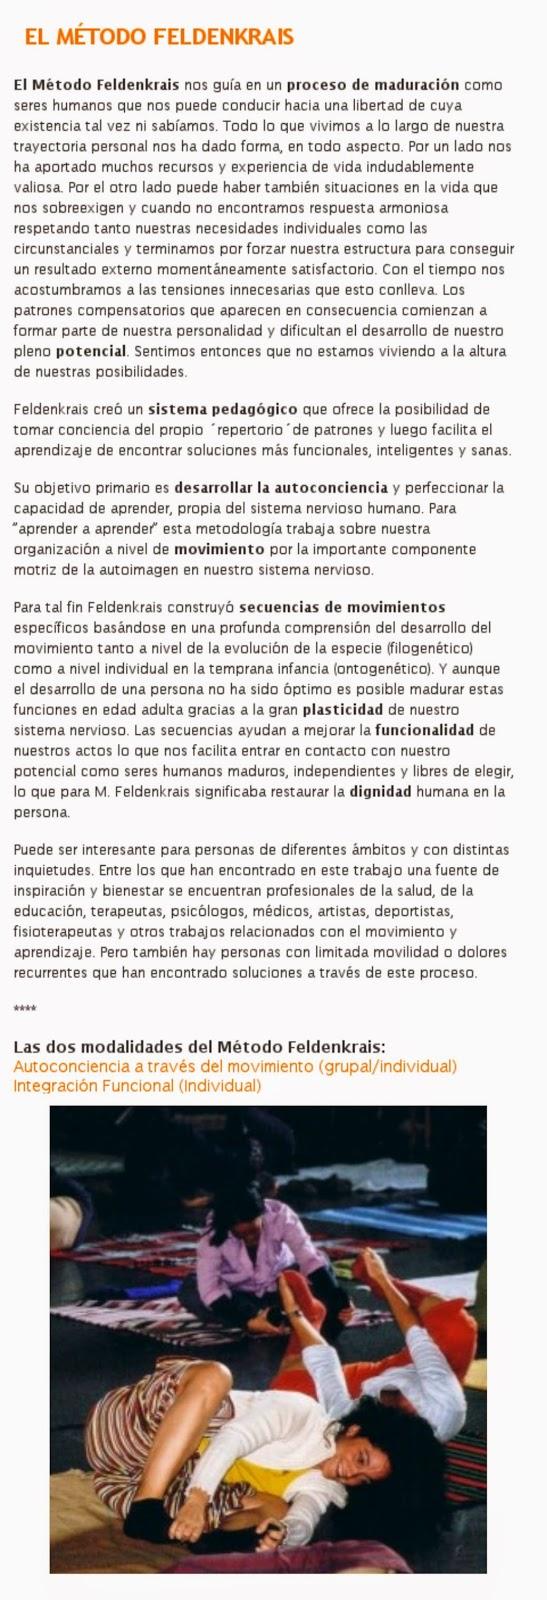 http://formacionfeldenkrais.es/web/